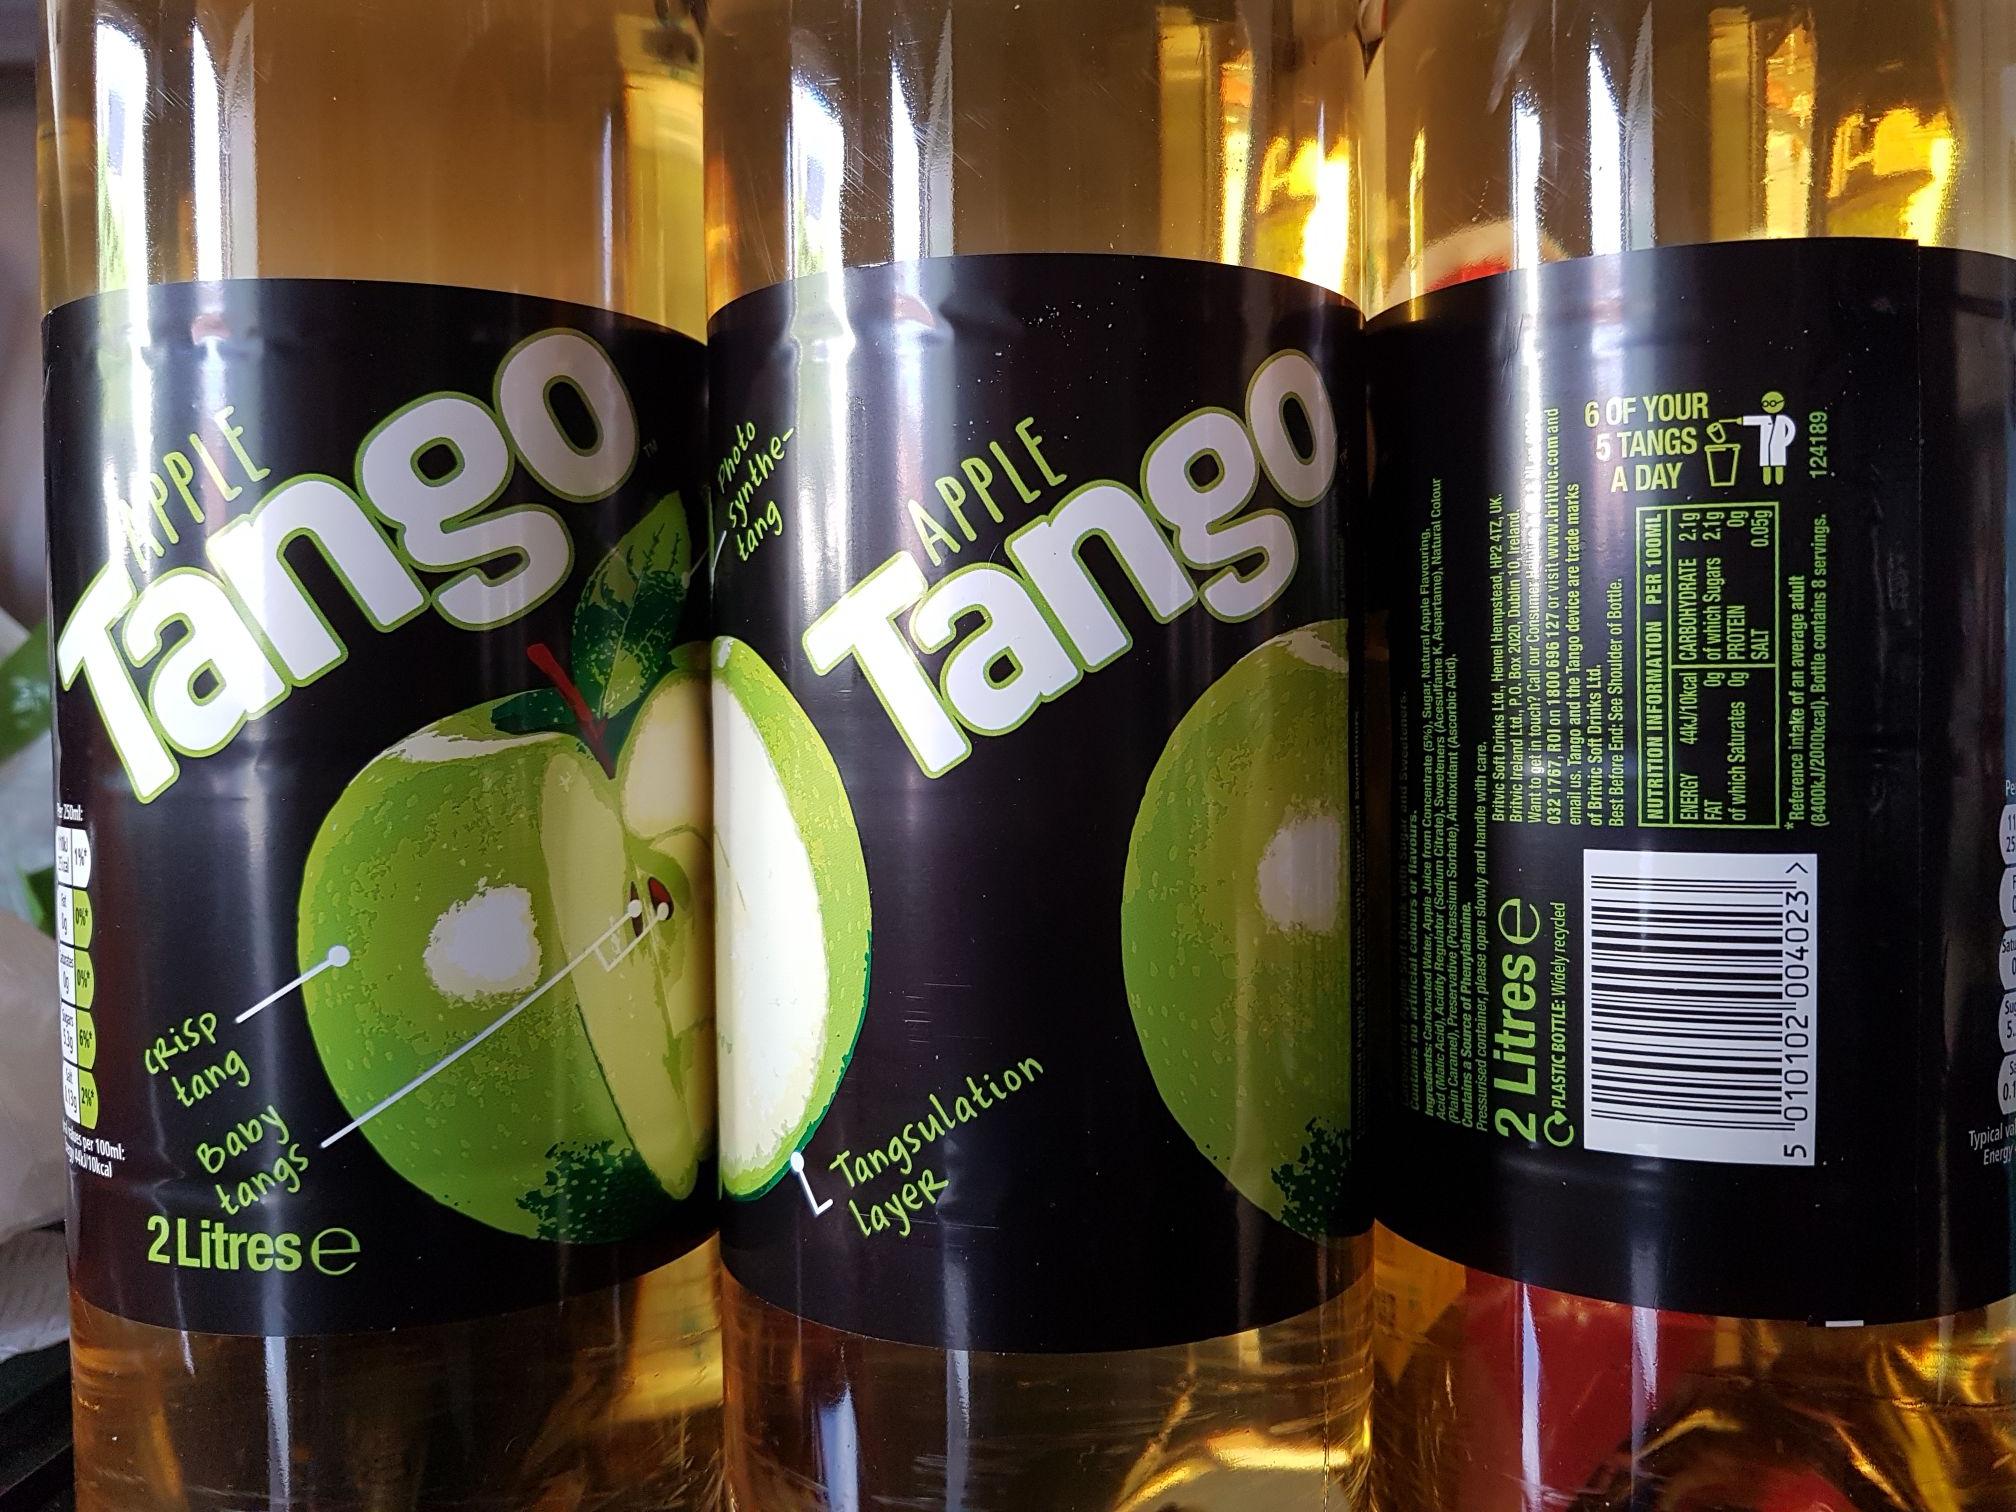 Apple Tango 2 x 2 Litres £1 @ Heron Foods